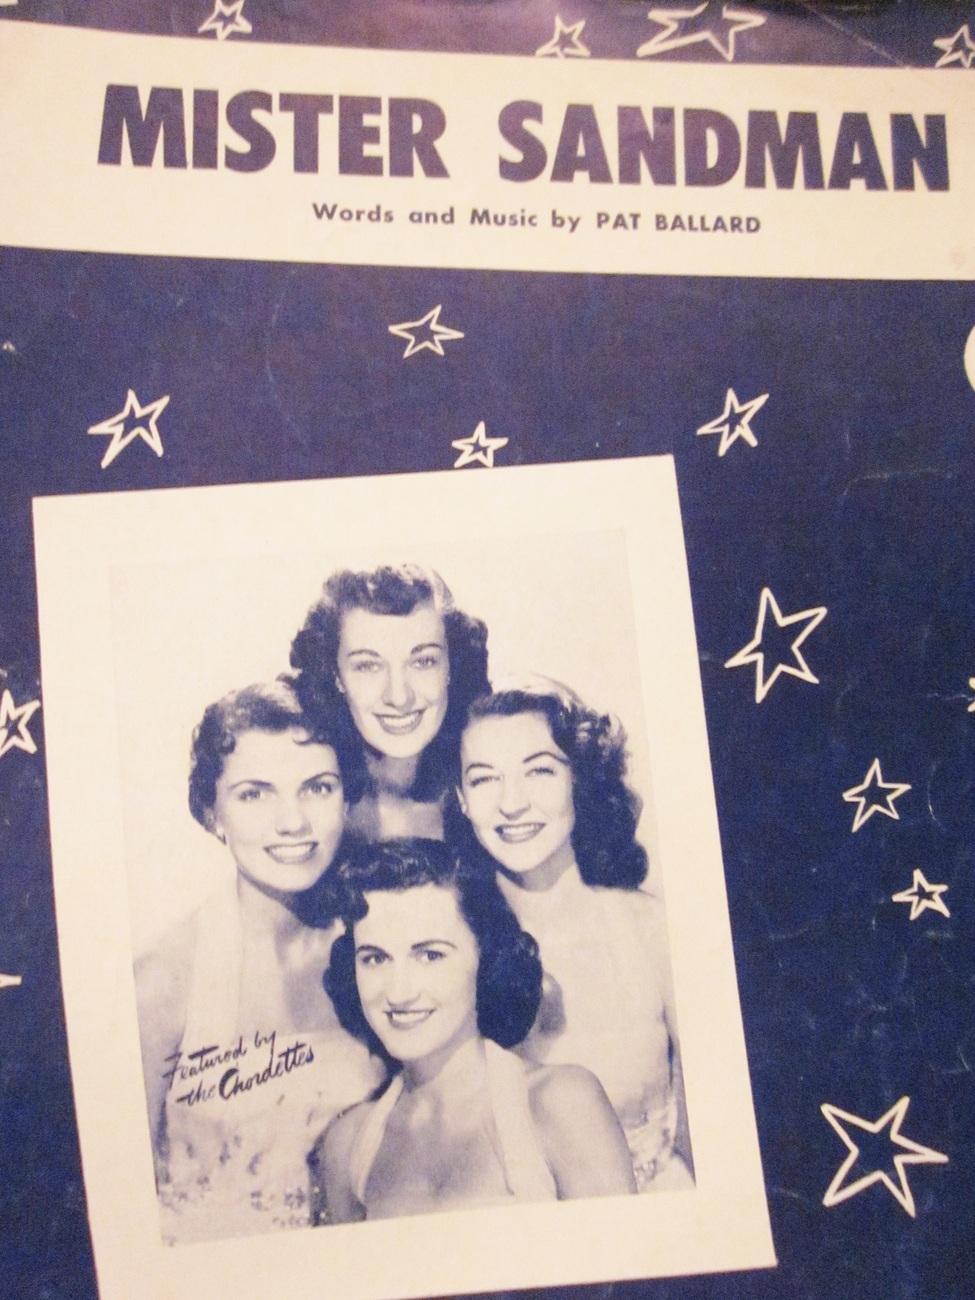 Sheet Music Mister Sandman by Pat Ballard as sung by The Chordettes